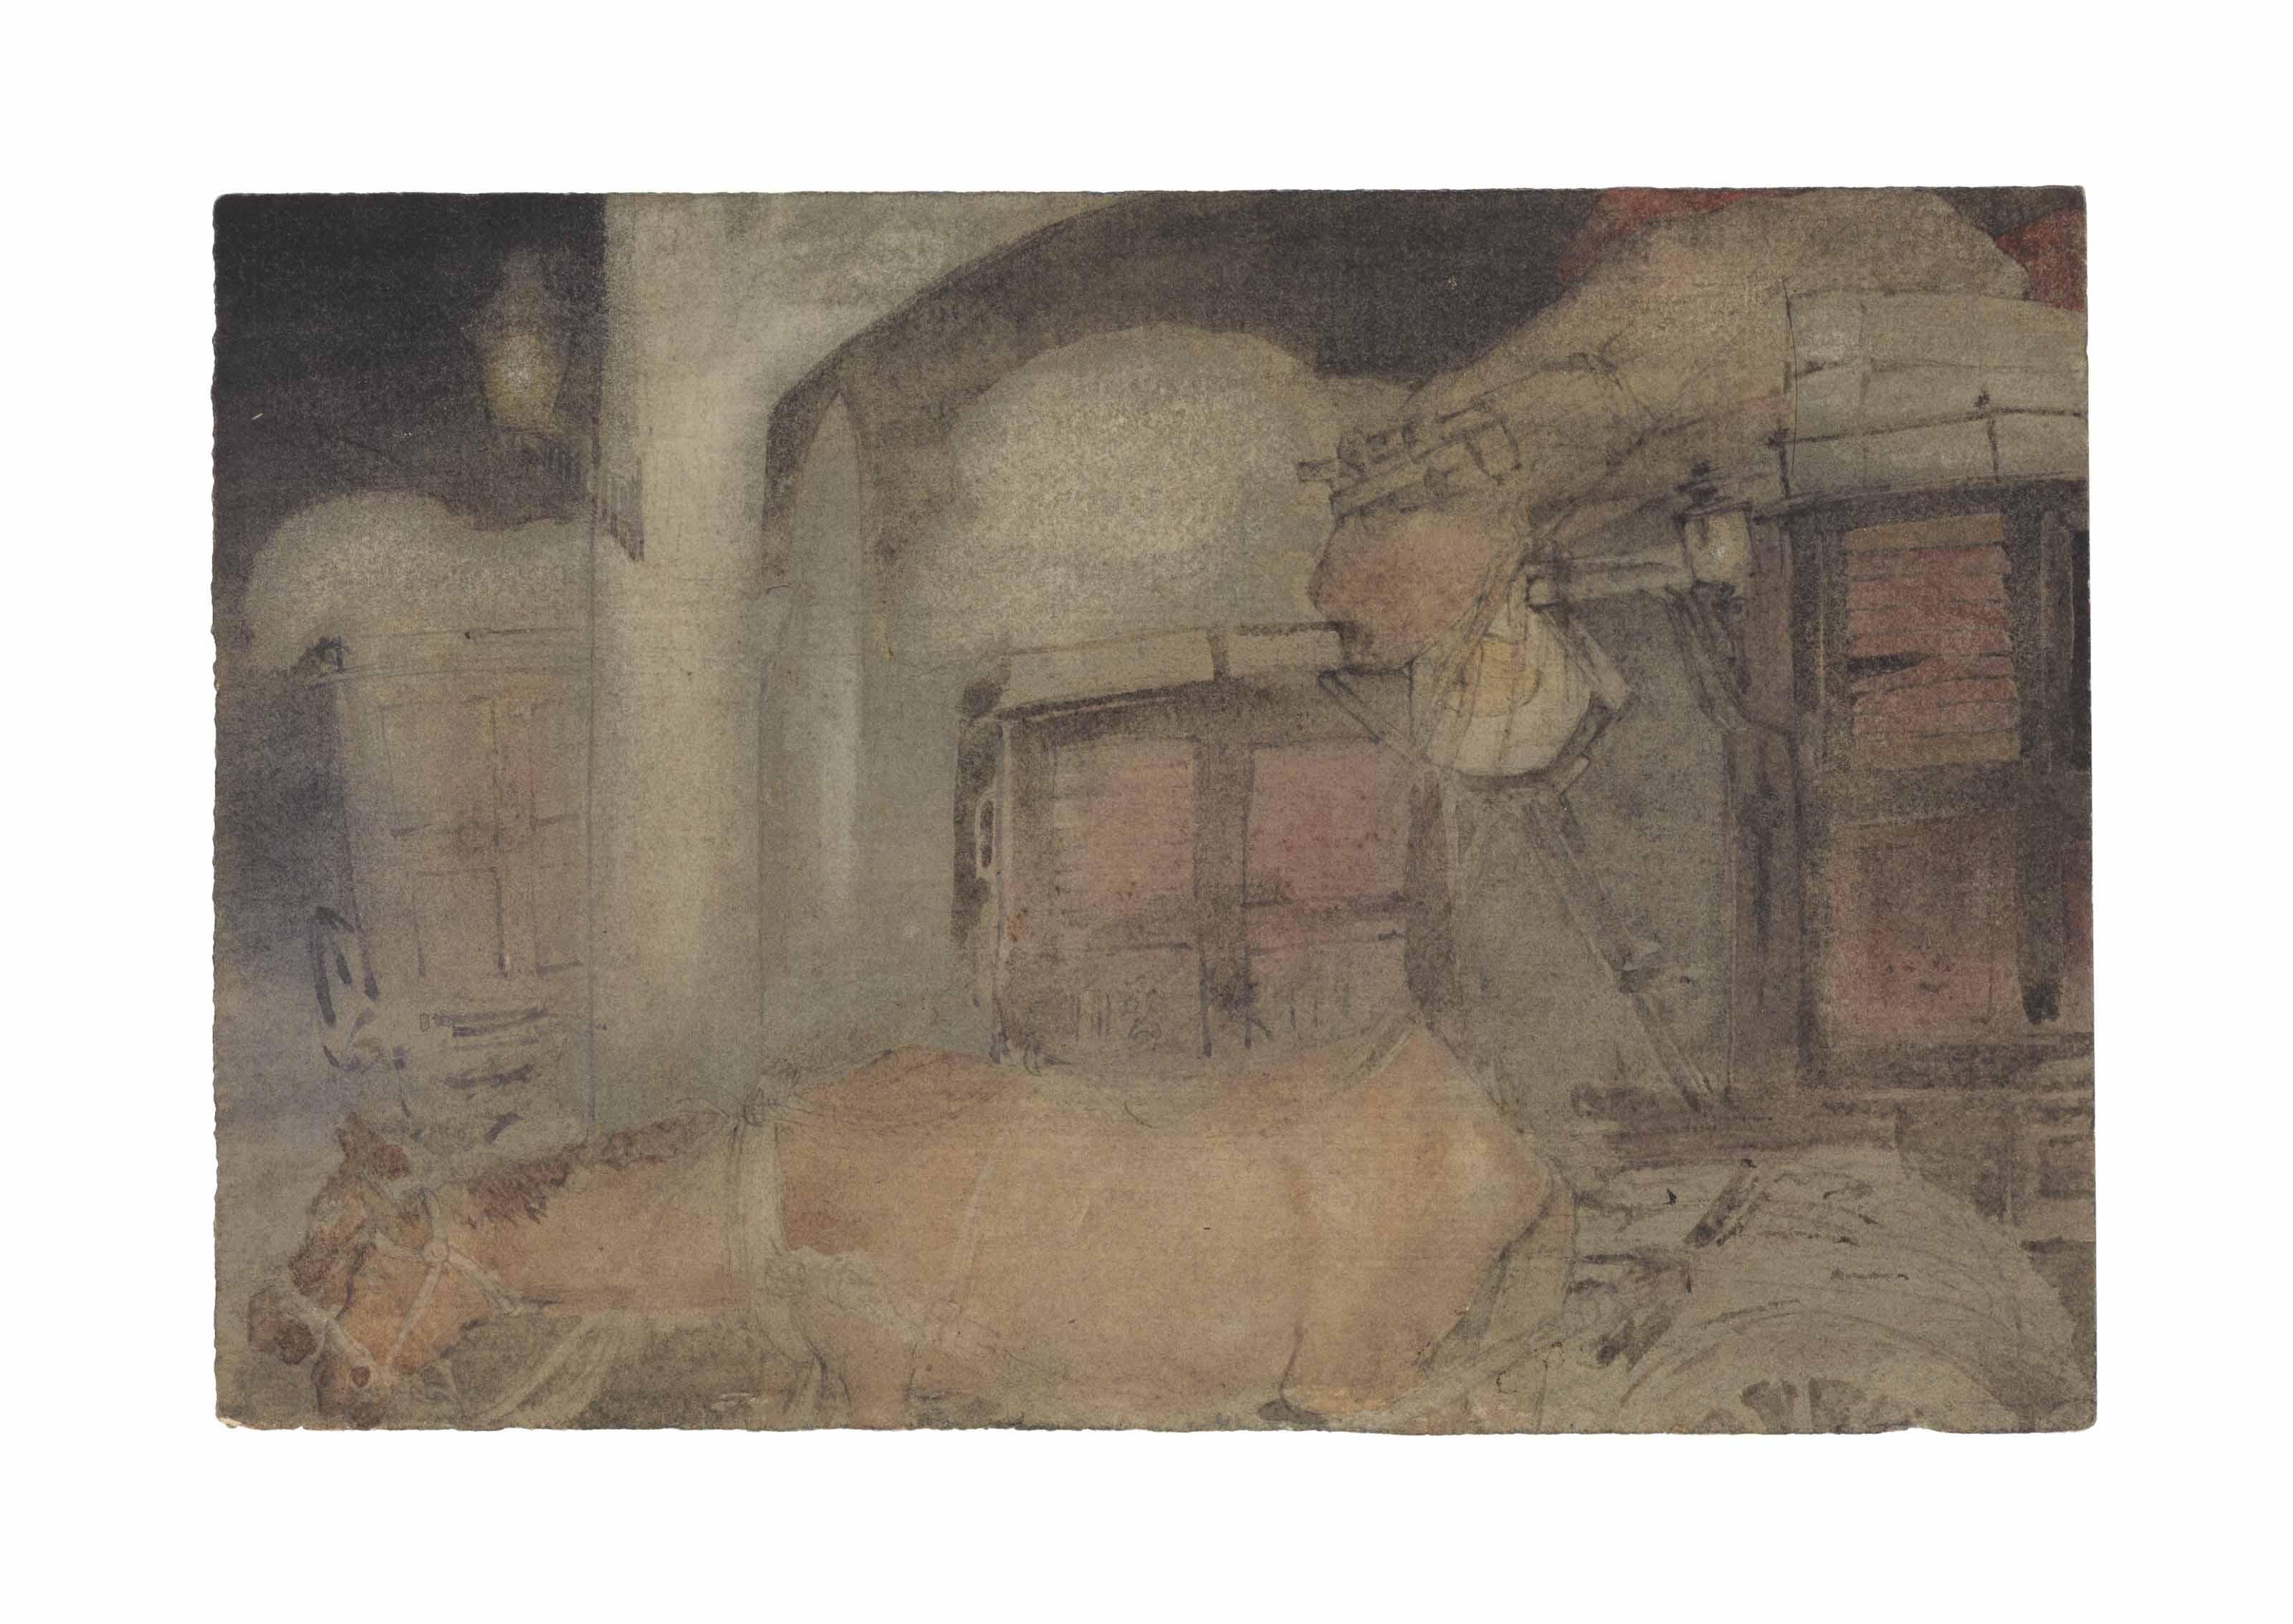 Untitled (Calcutta Night Scene with Horse Drawn Carriage)